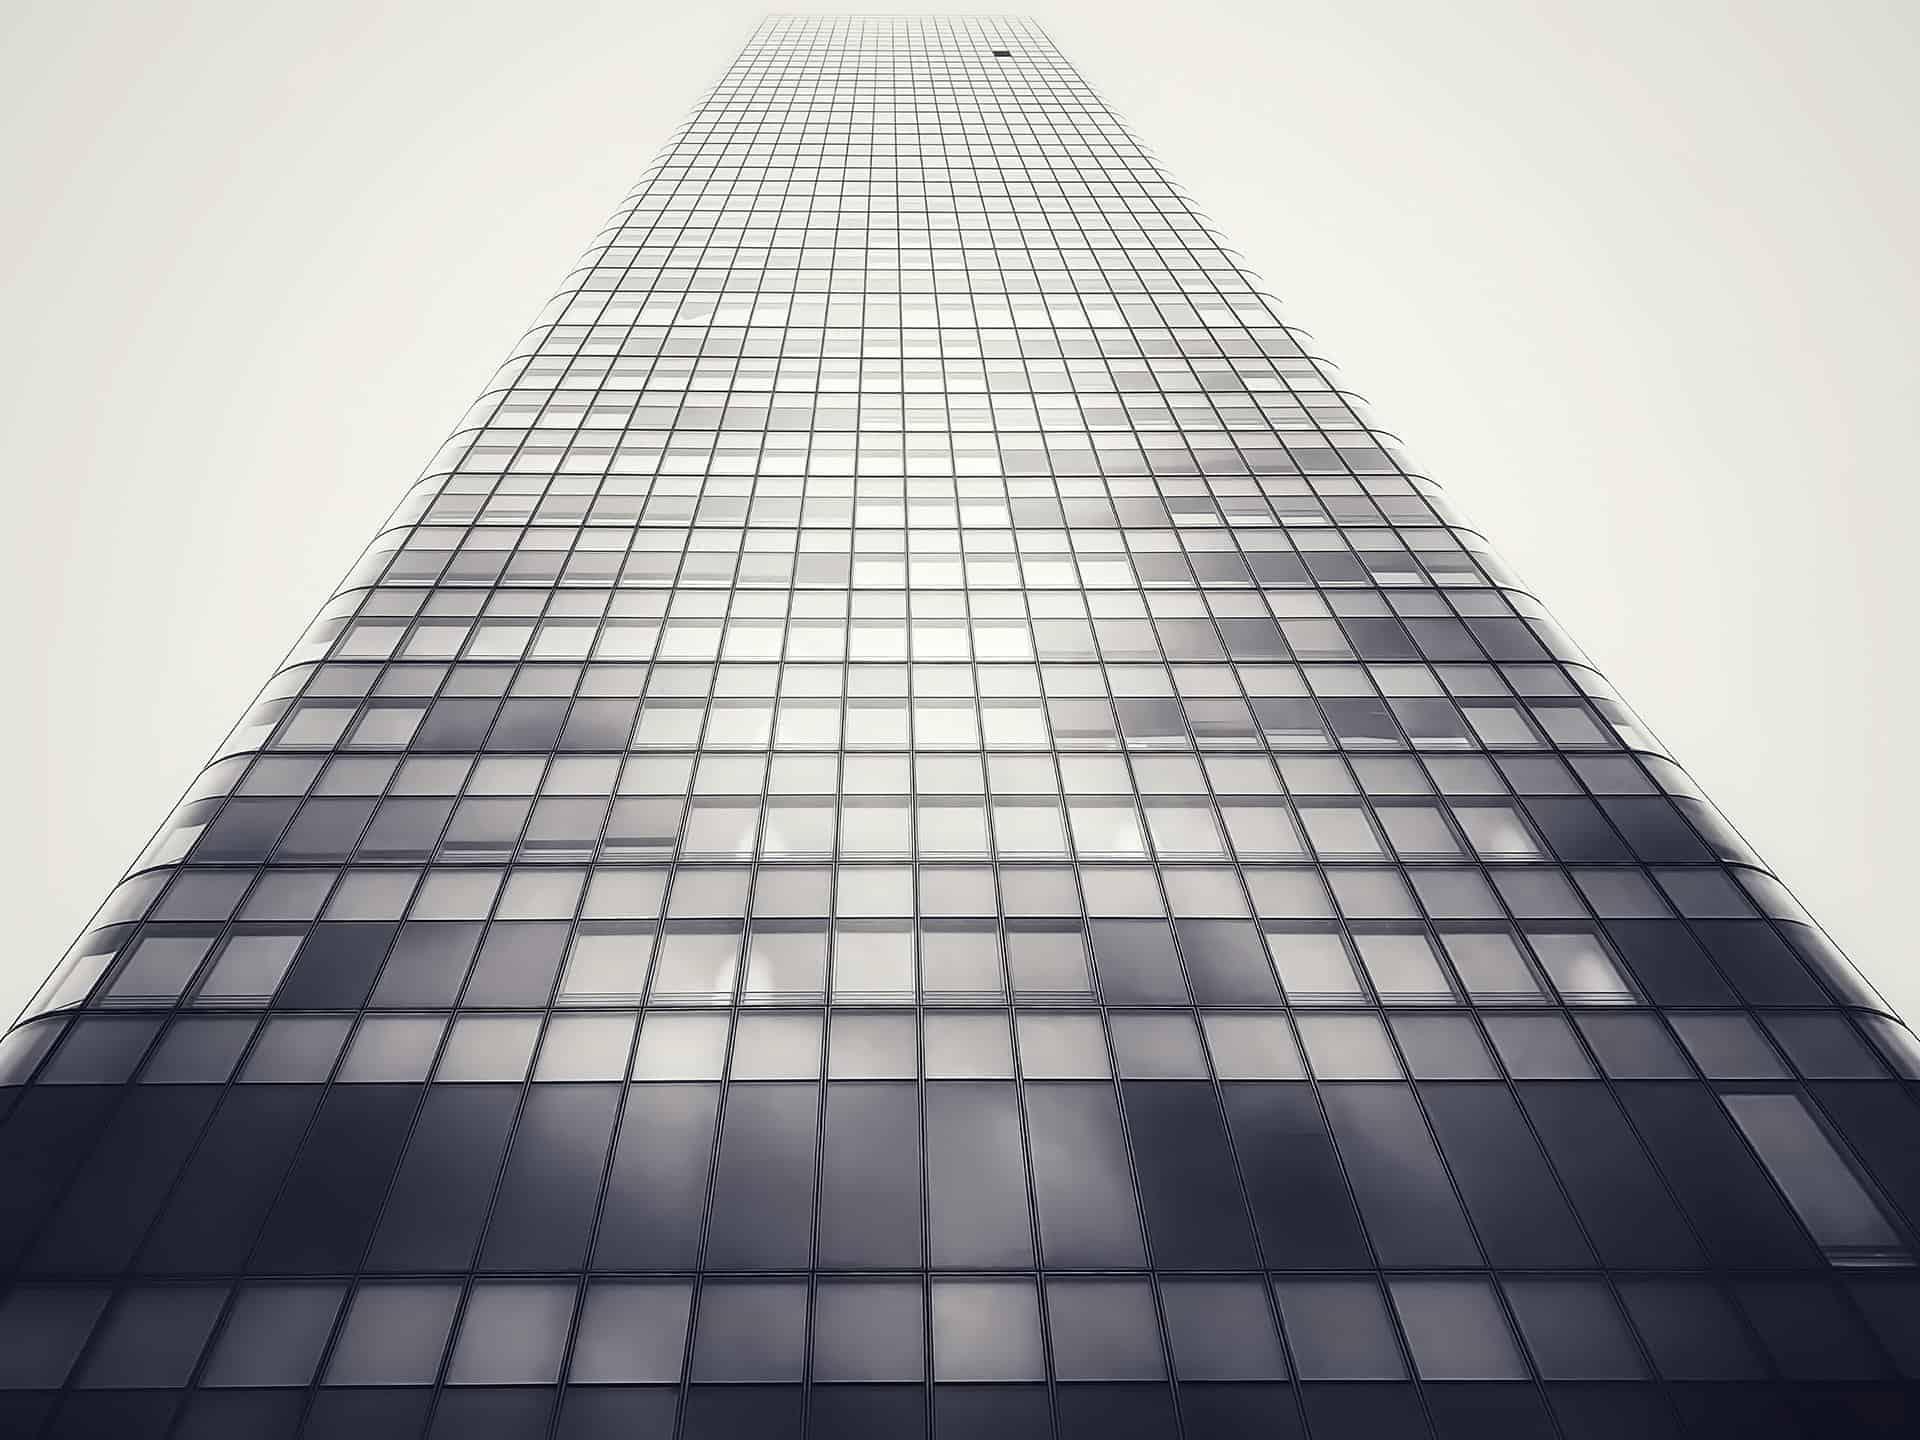 artnorama - Multistory Building